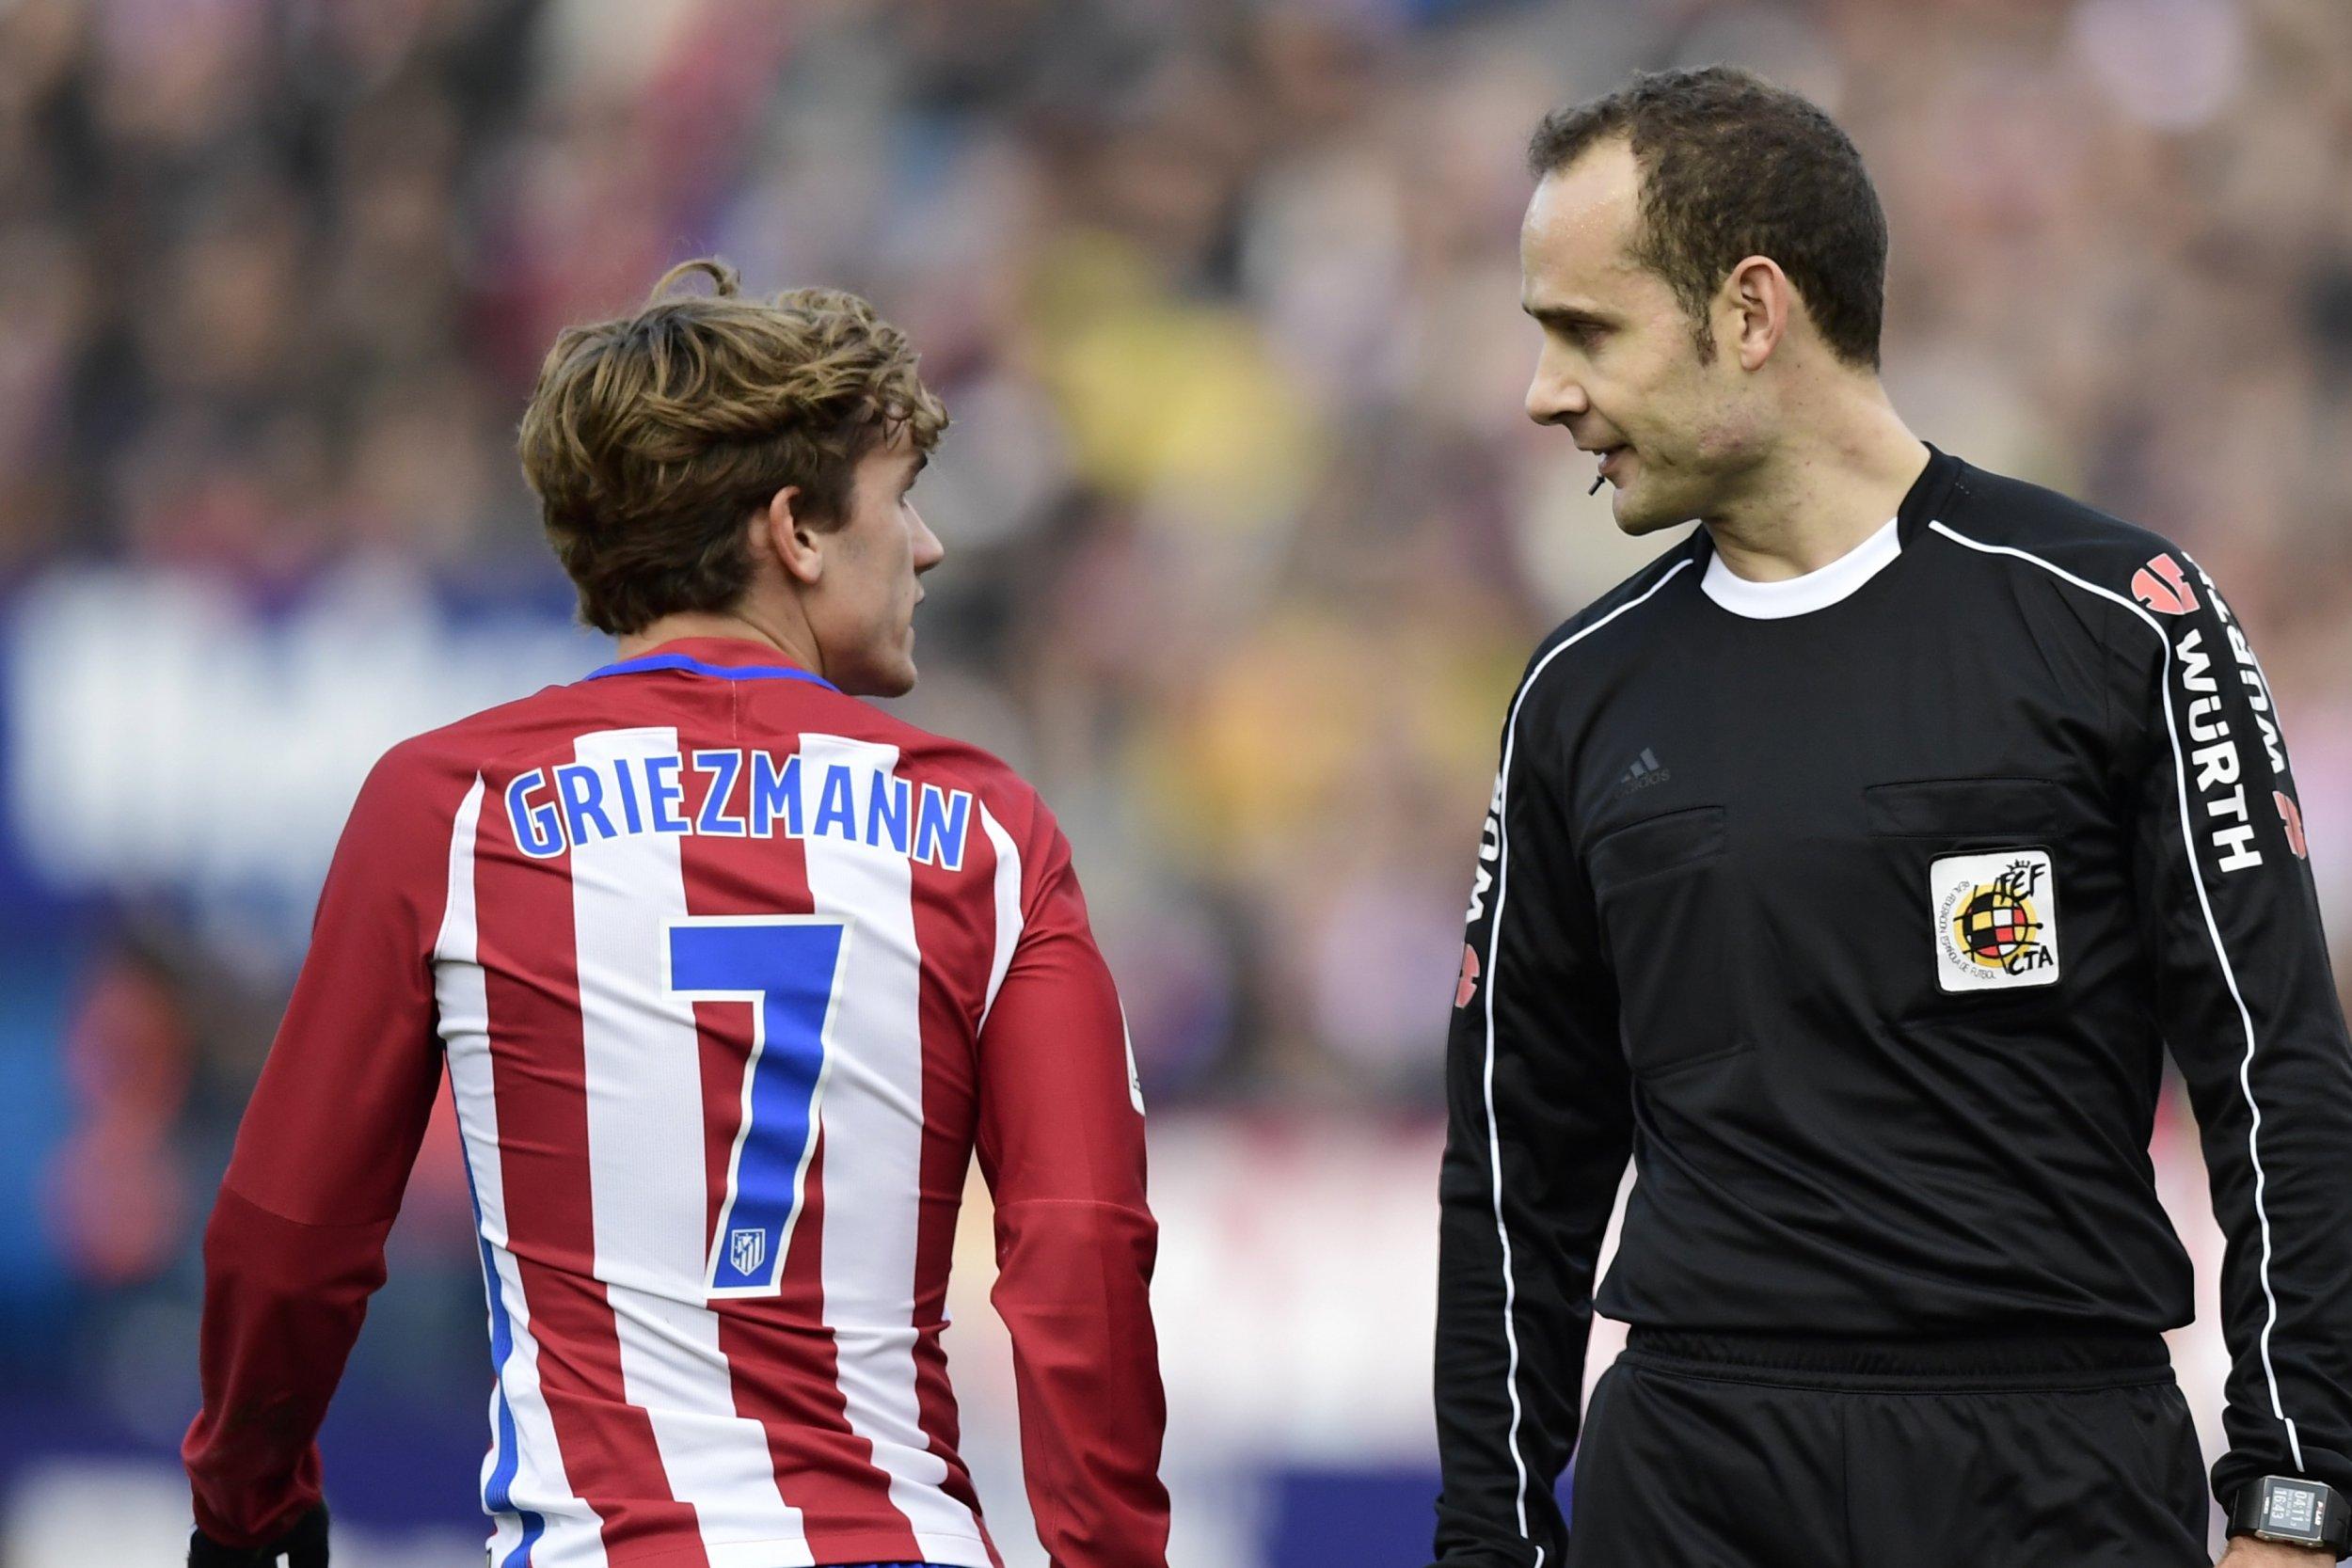 Atletico Madrid striker Antoine Griezmann